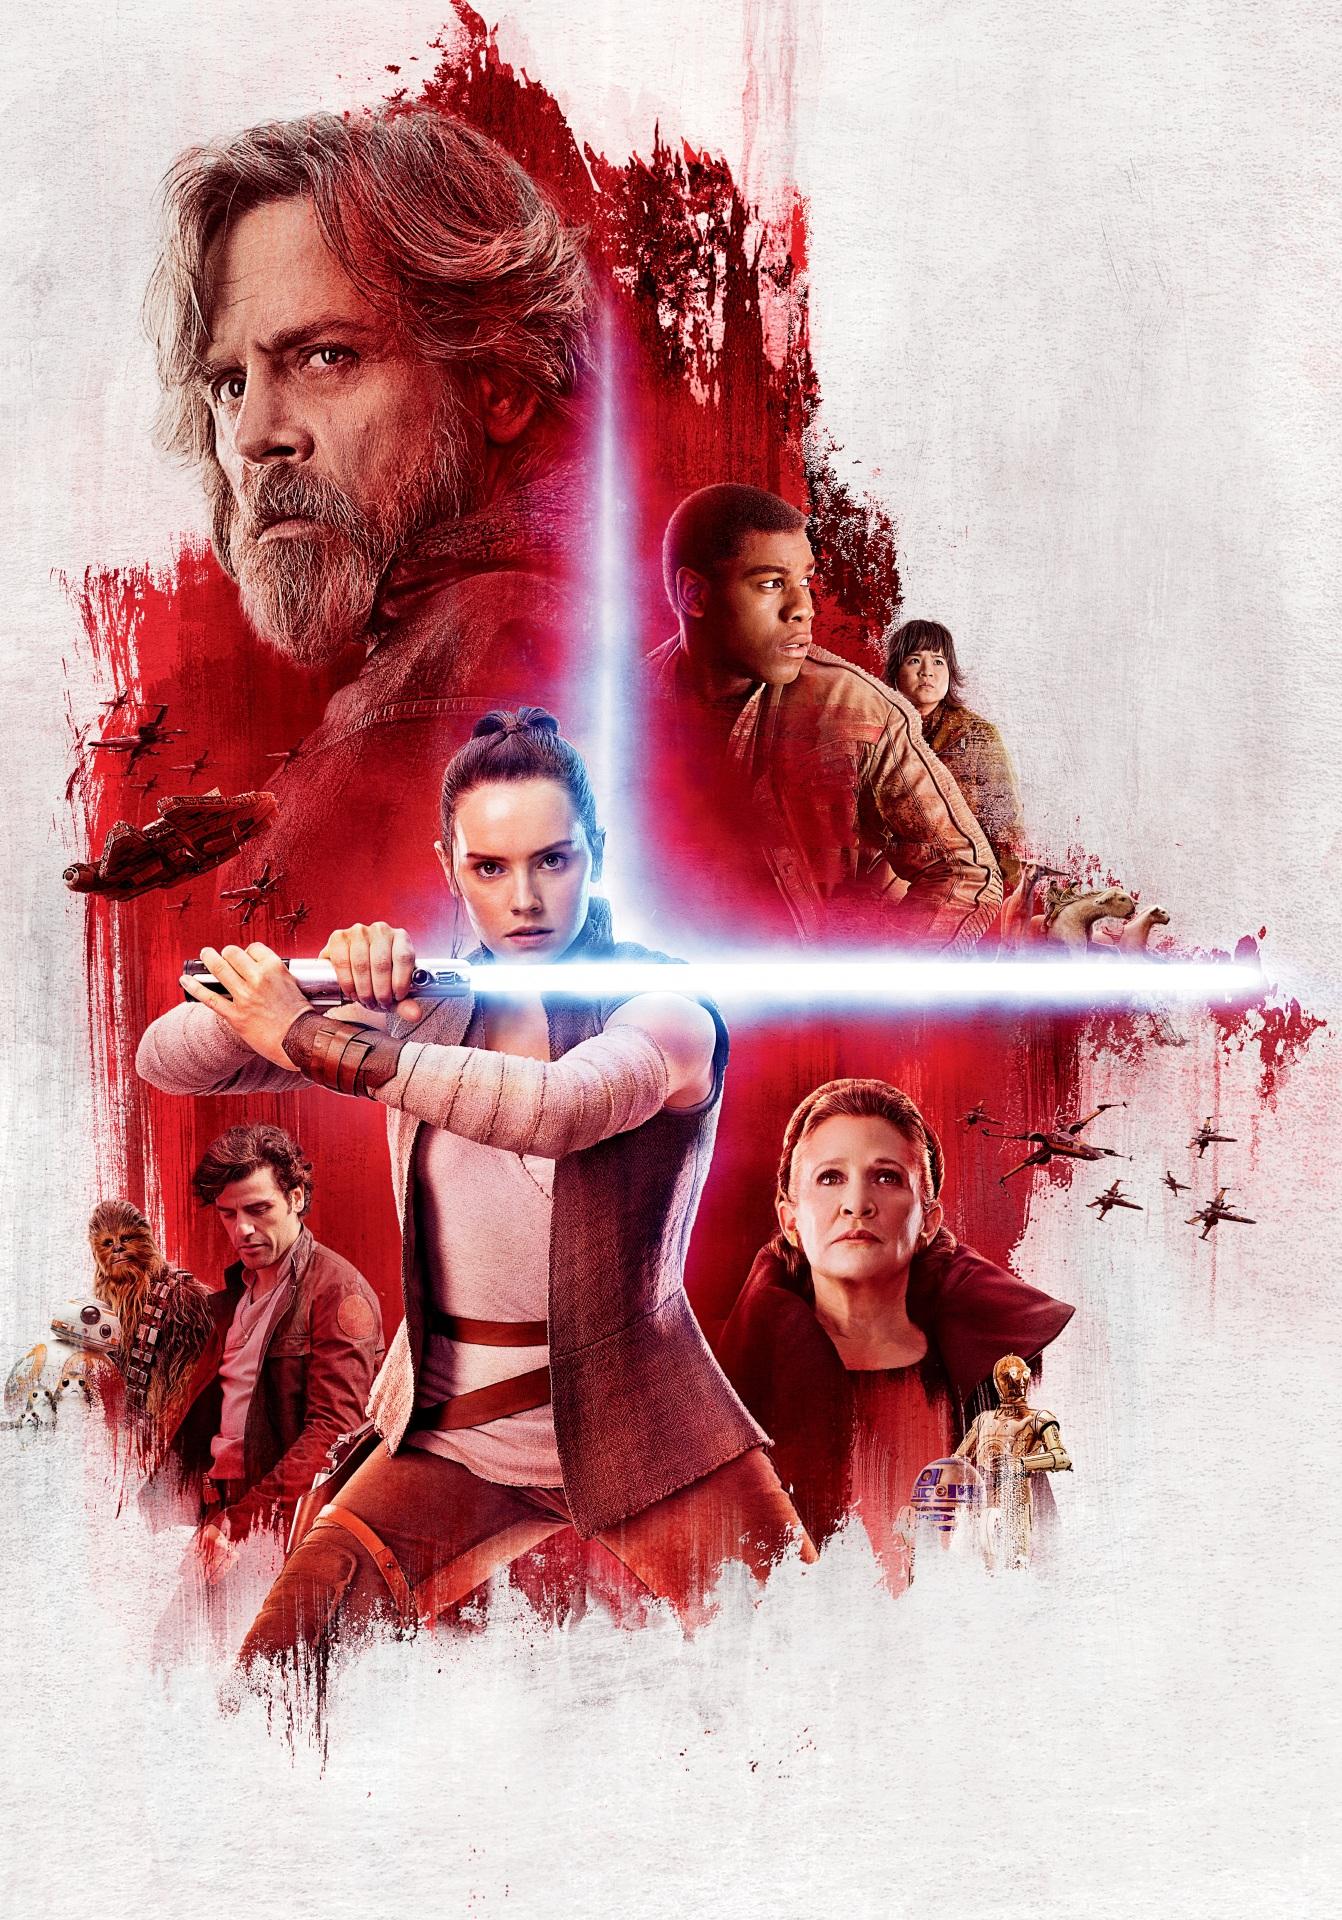 Desktop Wallpapers Female Star Wars The Last Jedi 1342x1920